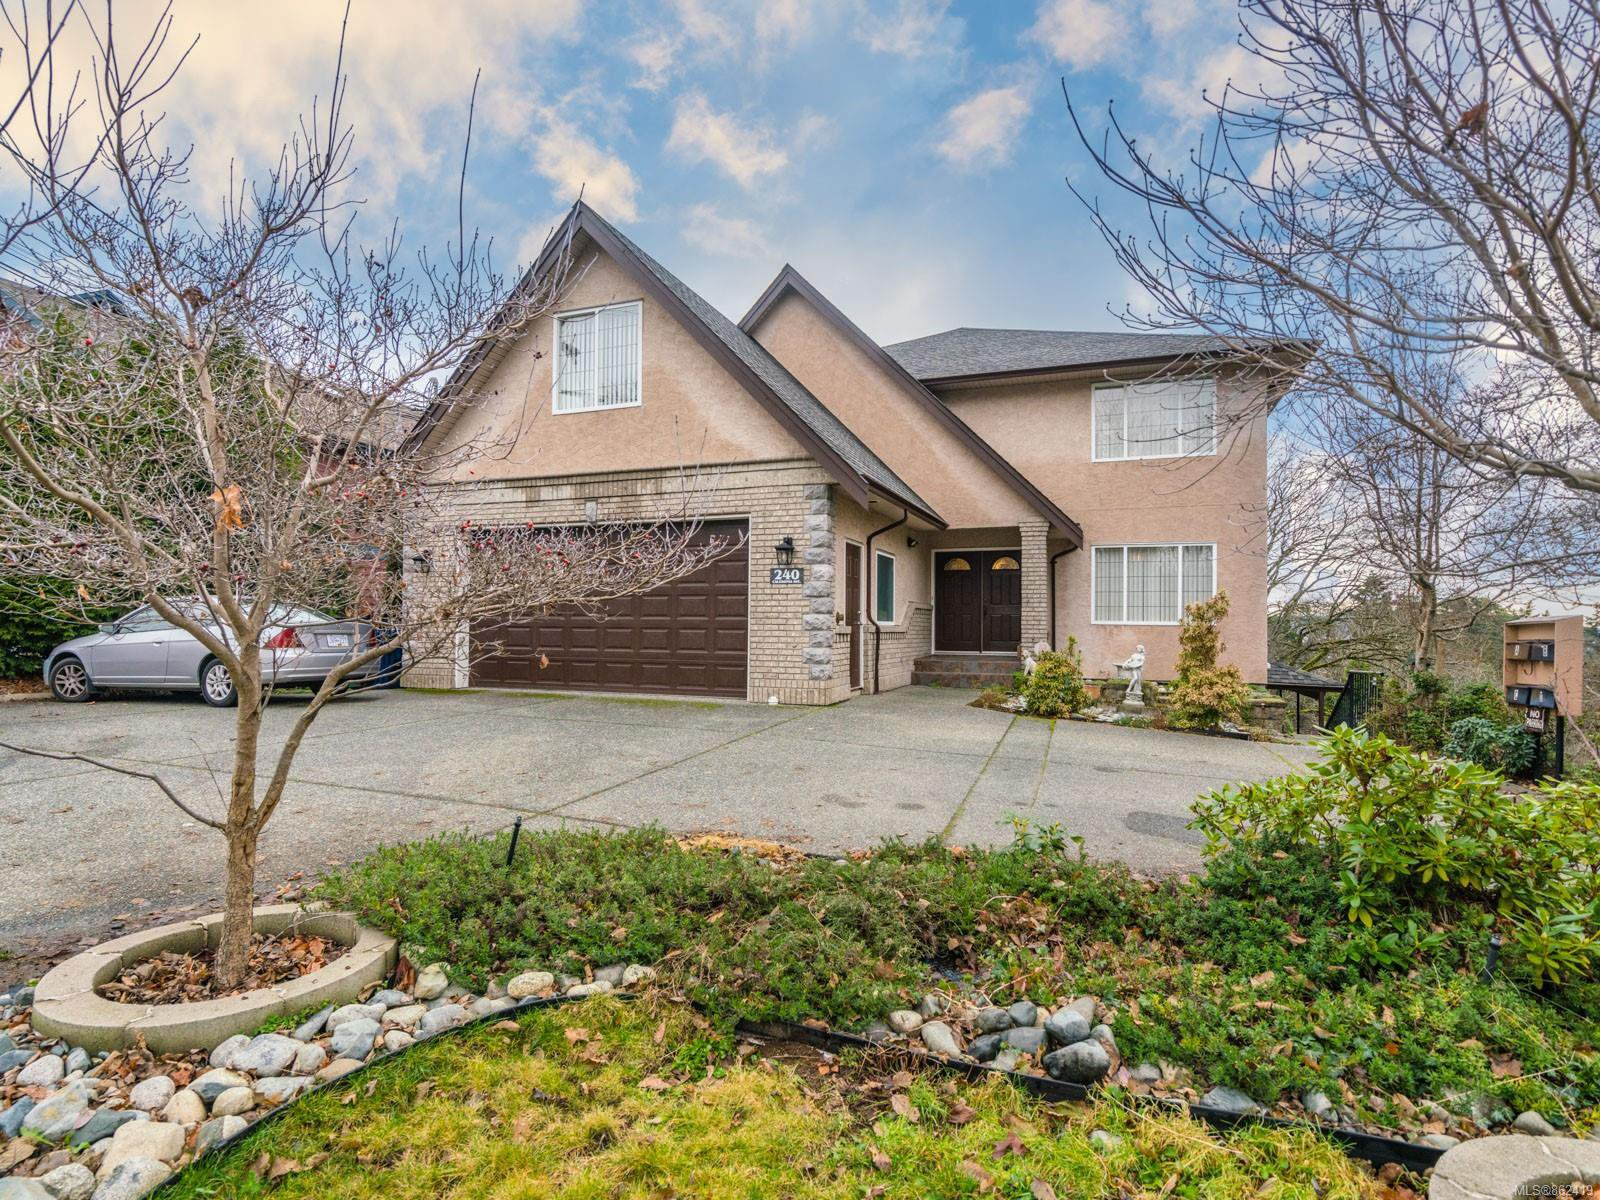 Main Photo: 240 Caledonia Ave in : Na Central Nanaimo Quadruplex for sale (Nanaimo)  : MLS®# 862419